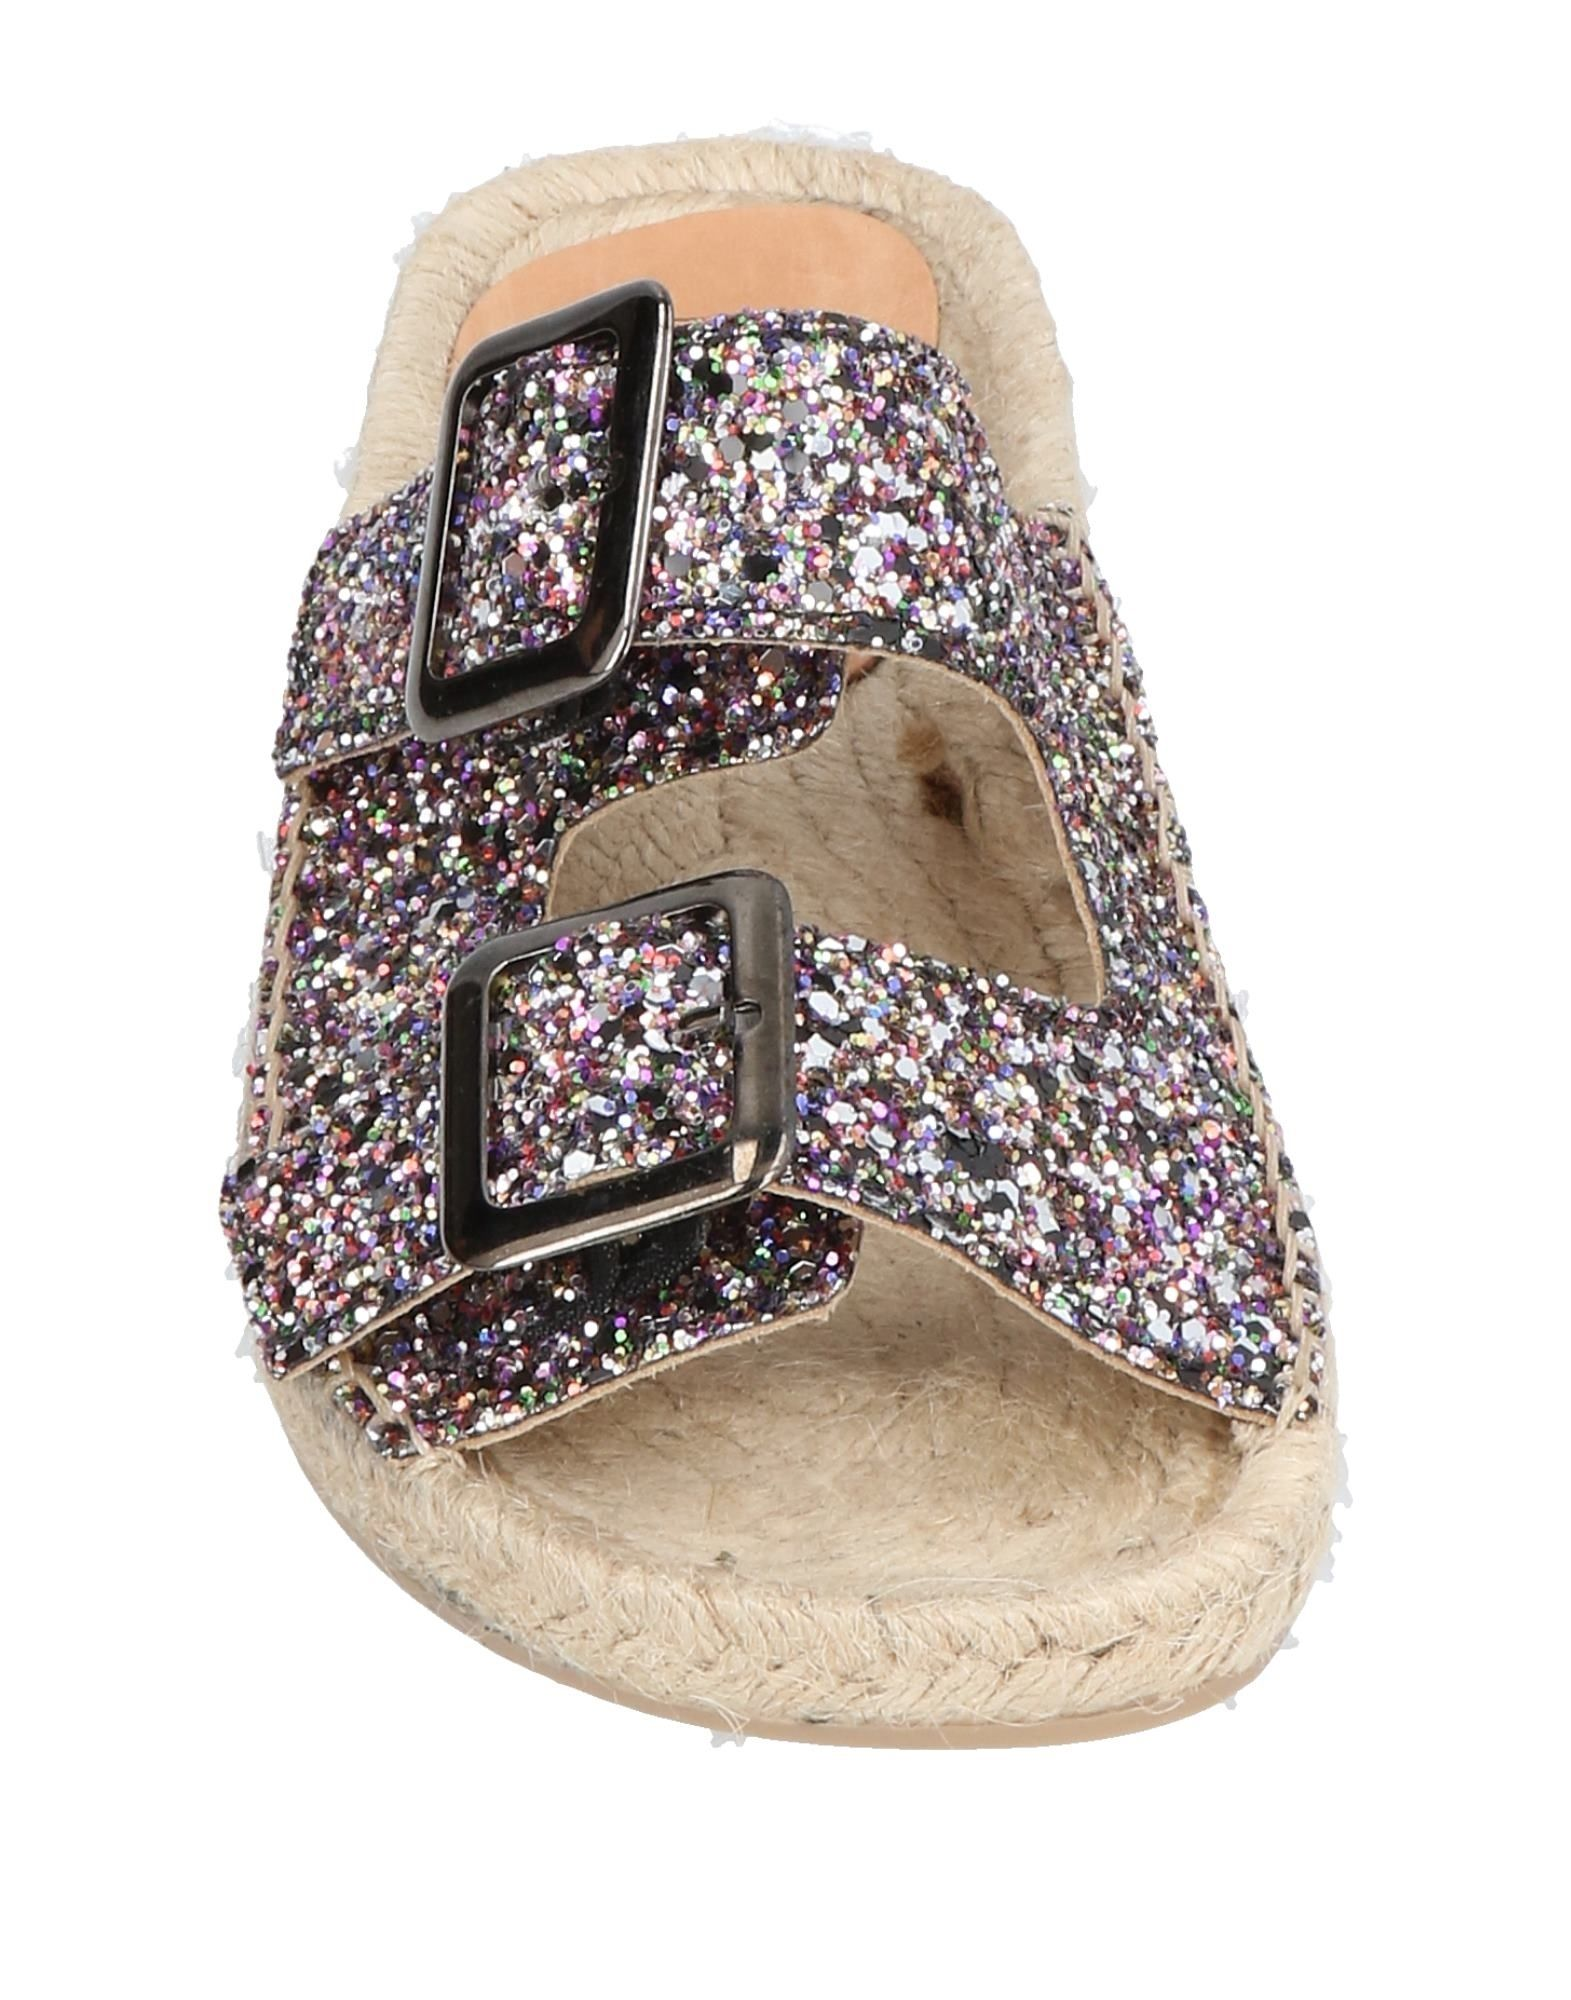 lagoa sandales - femmes royaume lagoa 11433018um sandales en ligne le royaume femmes - uni - df5008